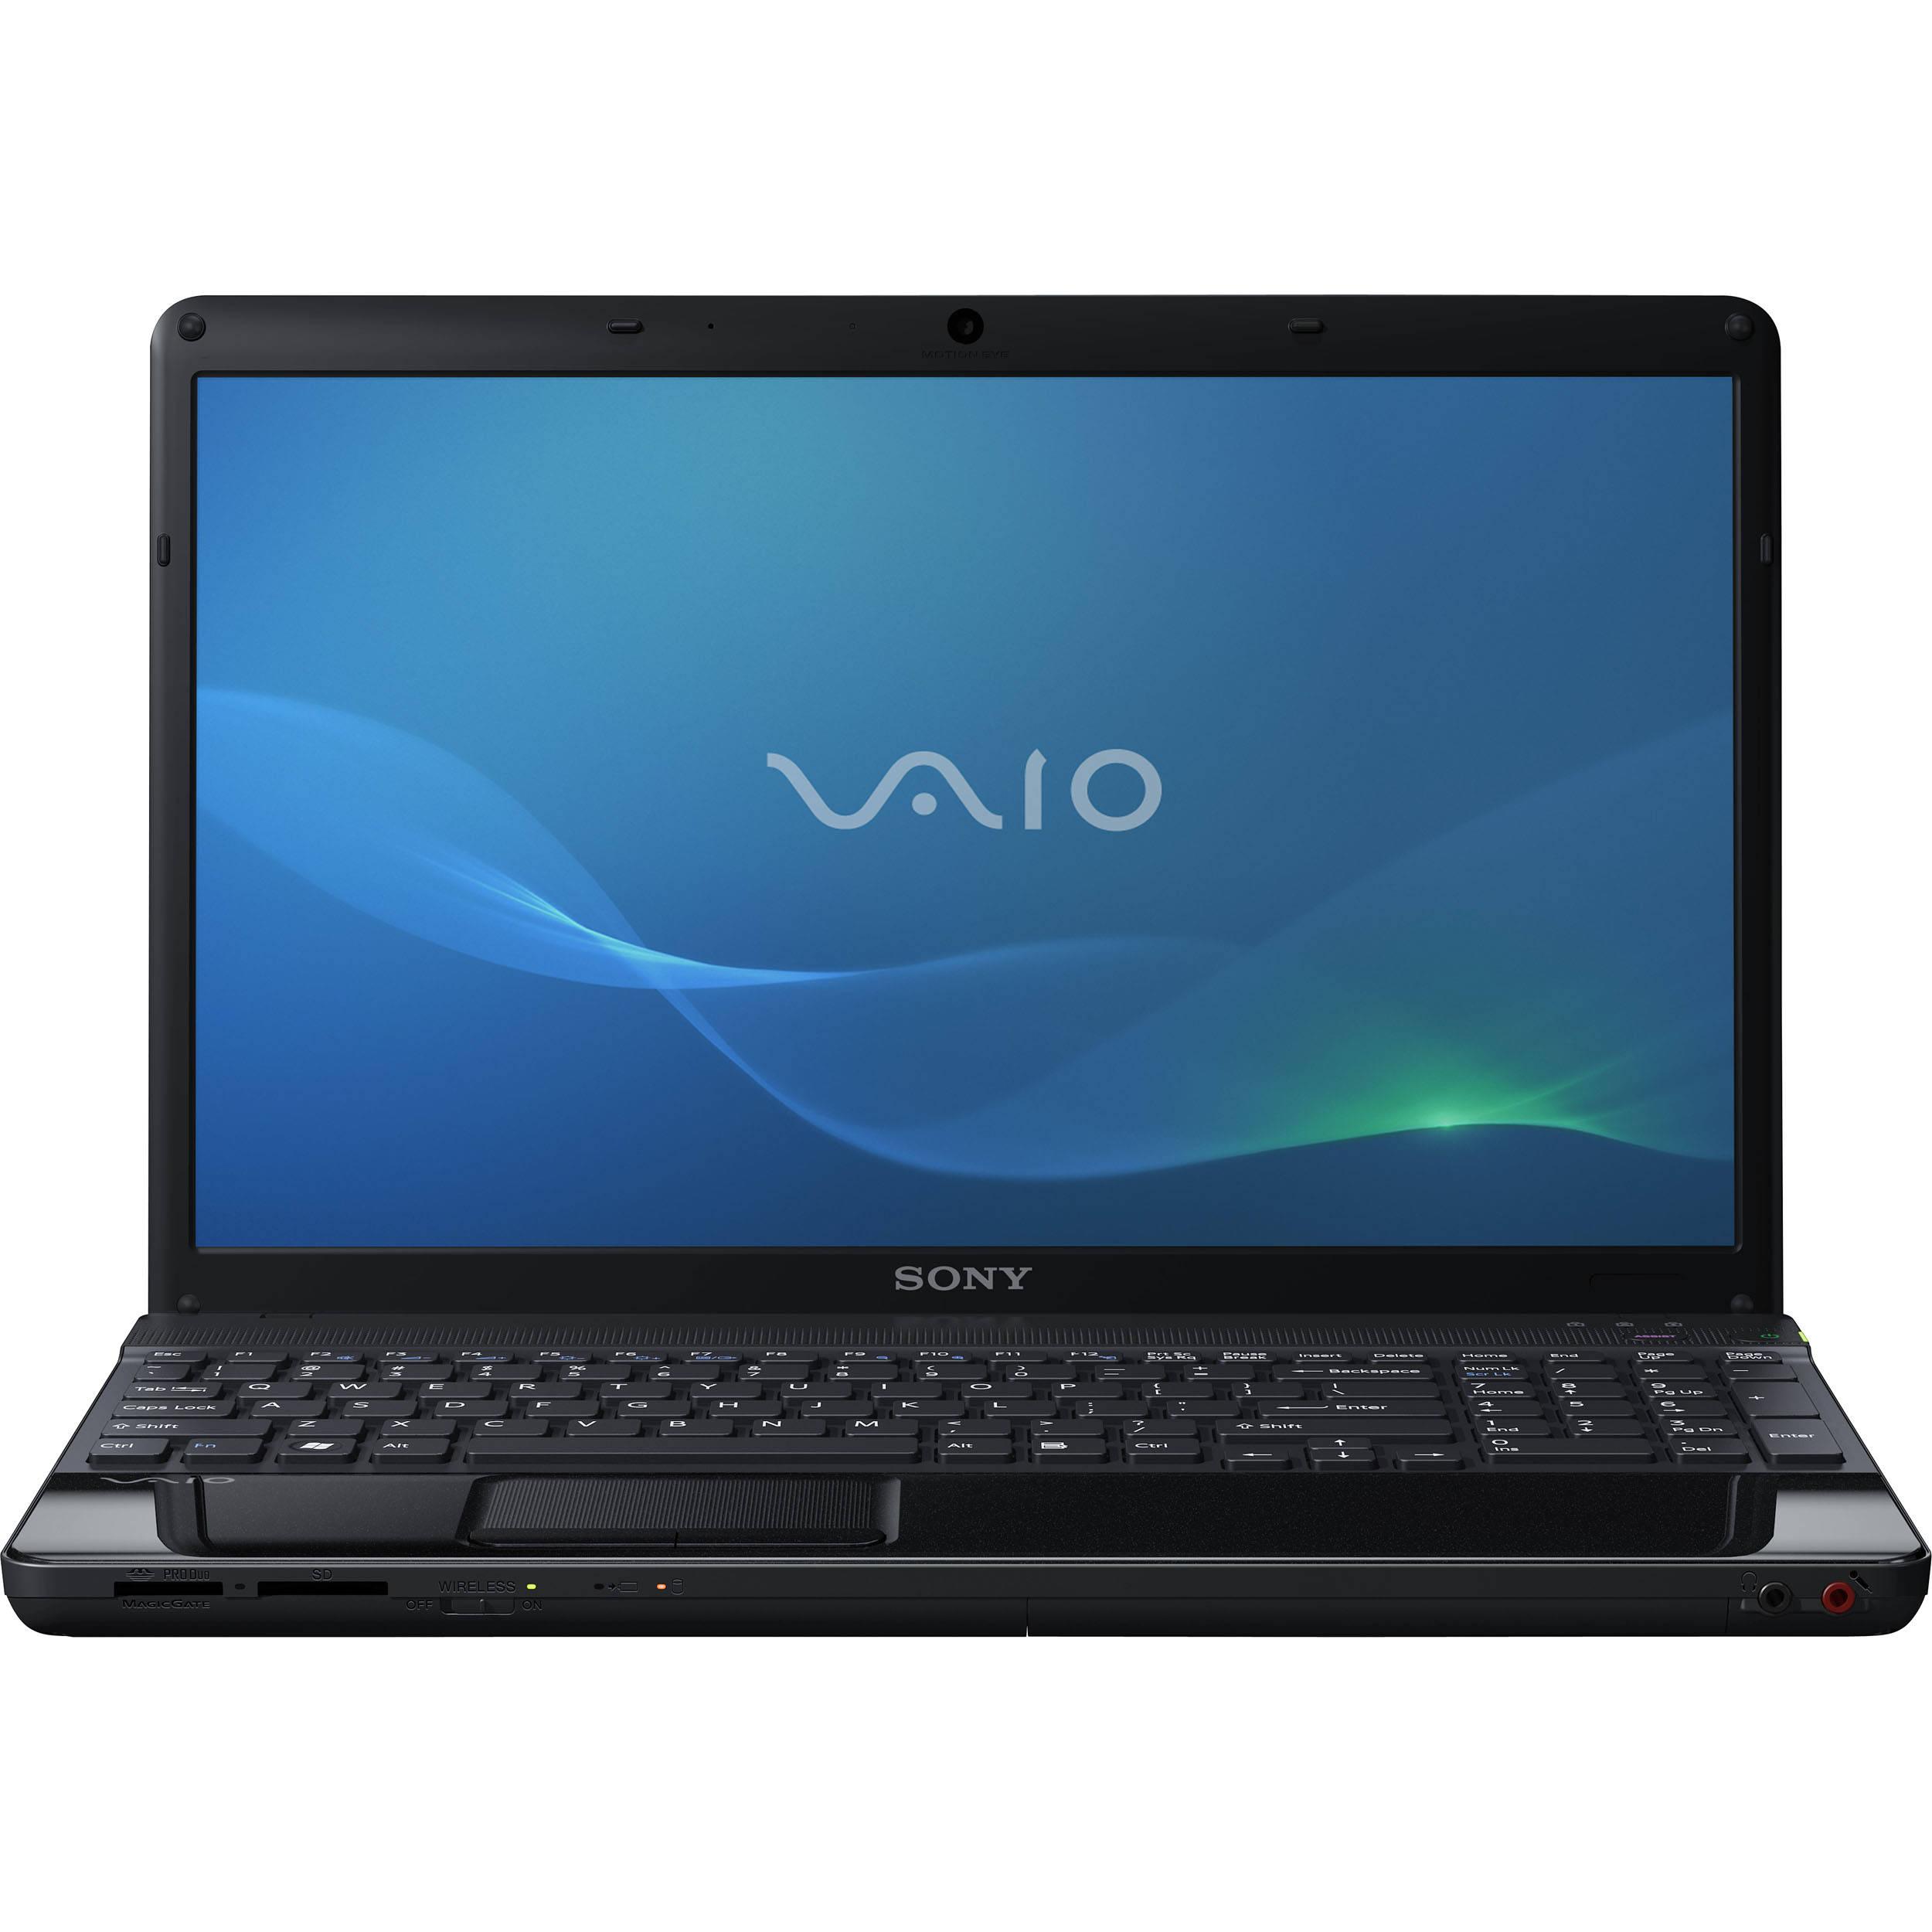 Sony Vaio VPCEE32FX/BJ ATI Mobility Radeon HD 4250 Graphics Last